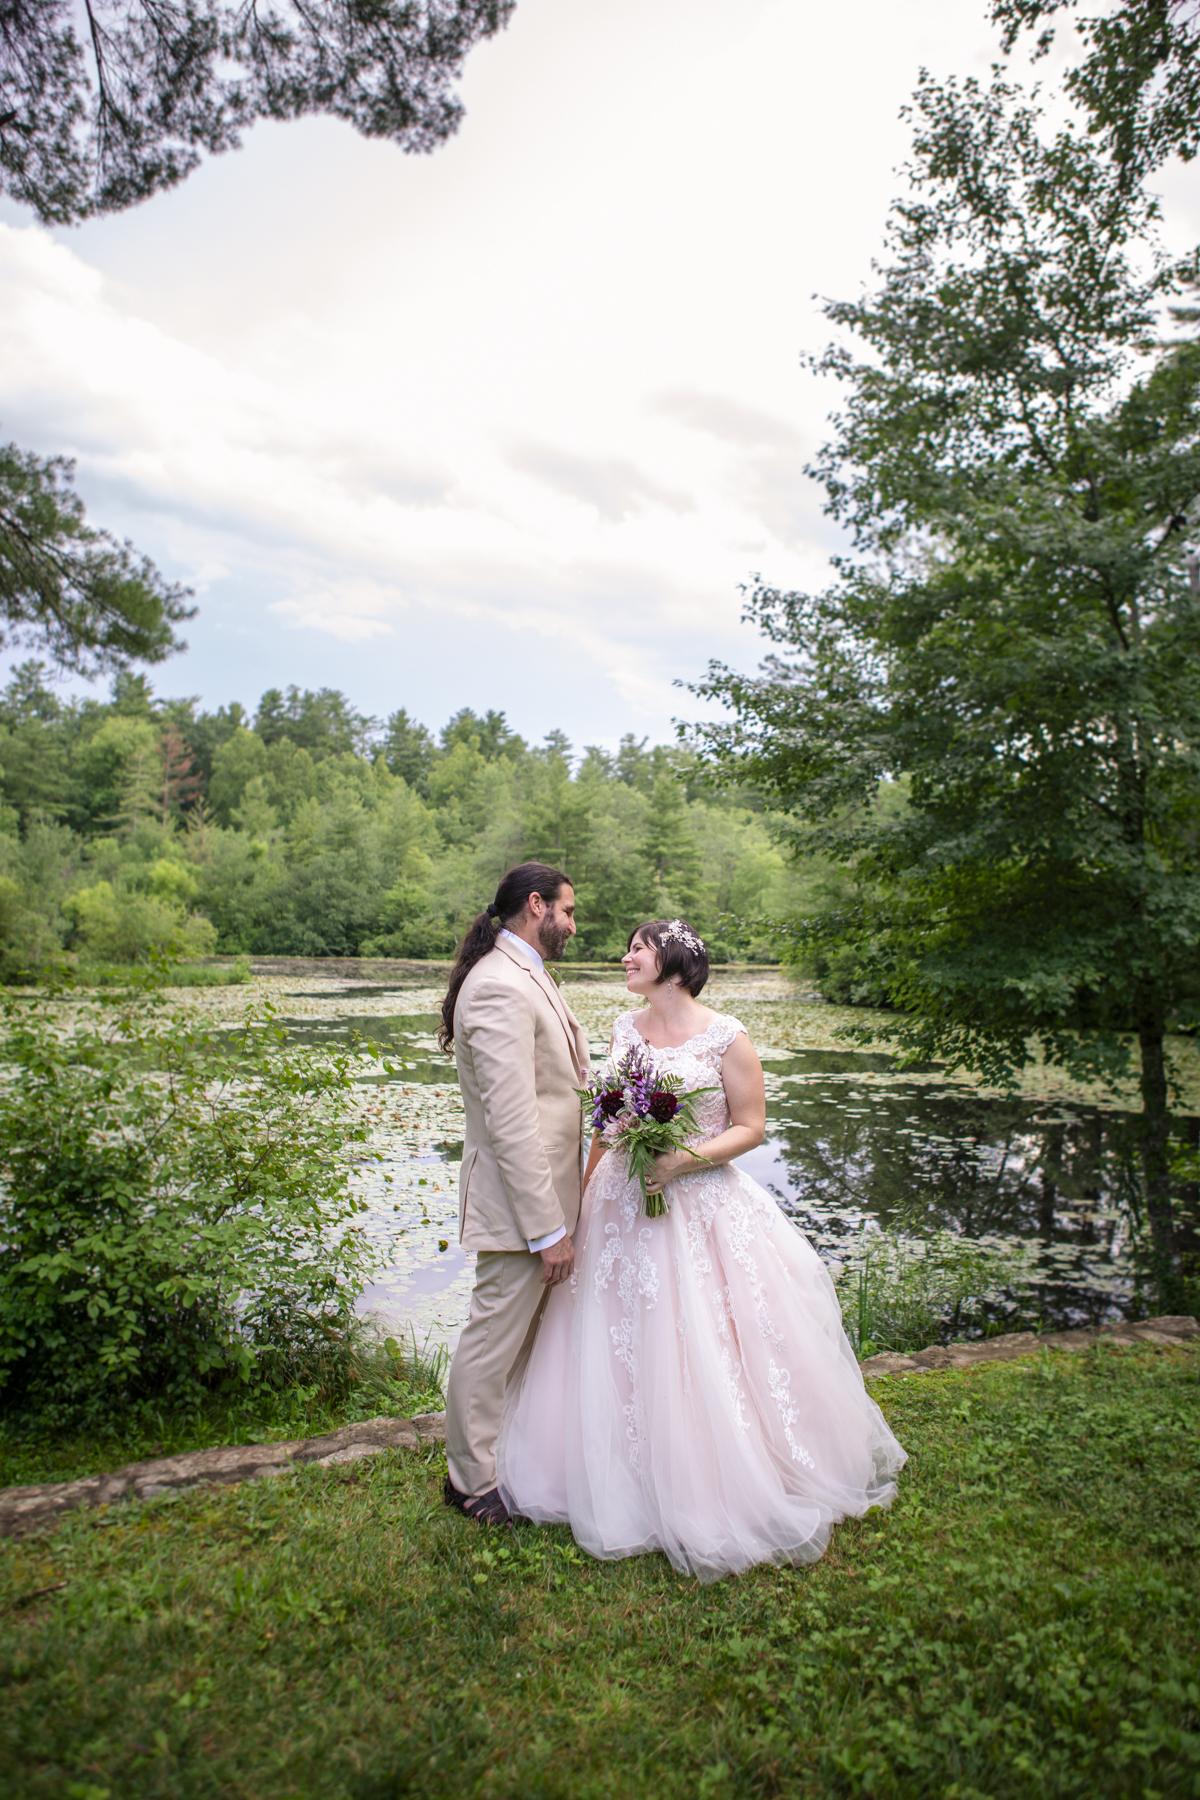 Avyanna and Phoenix Wedding 2019_photos by Studio Misha_BLOG-129.jpg